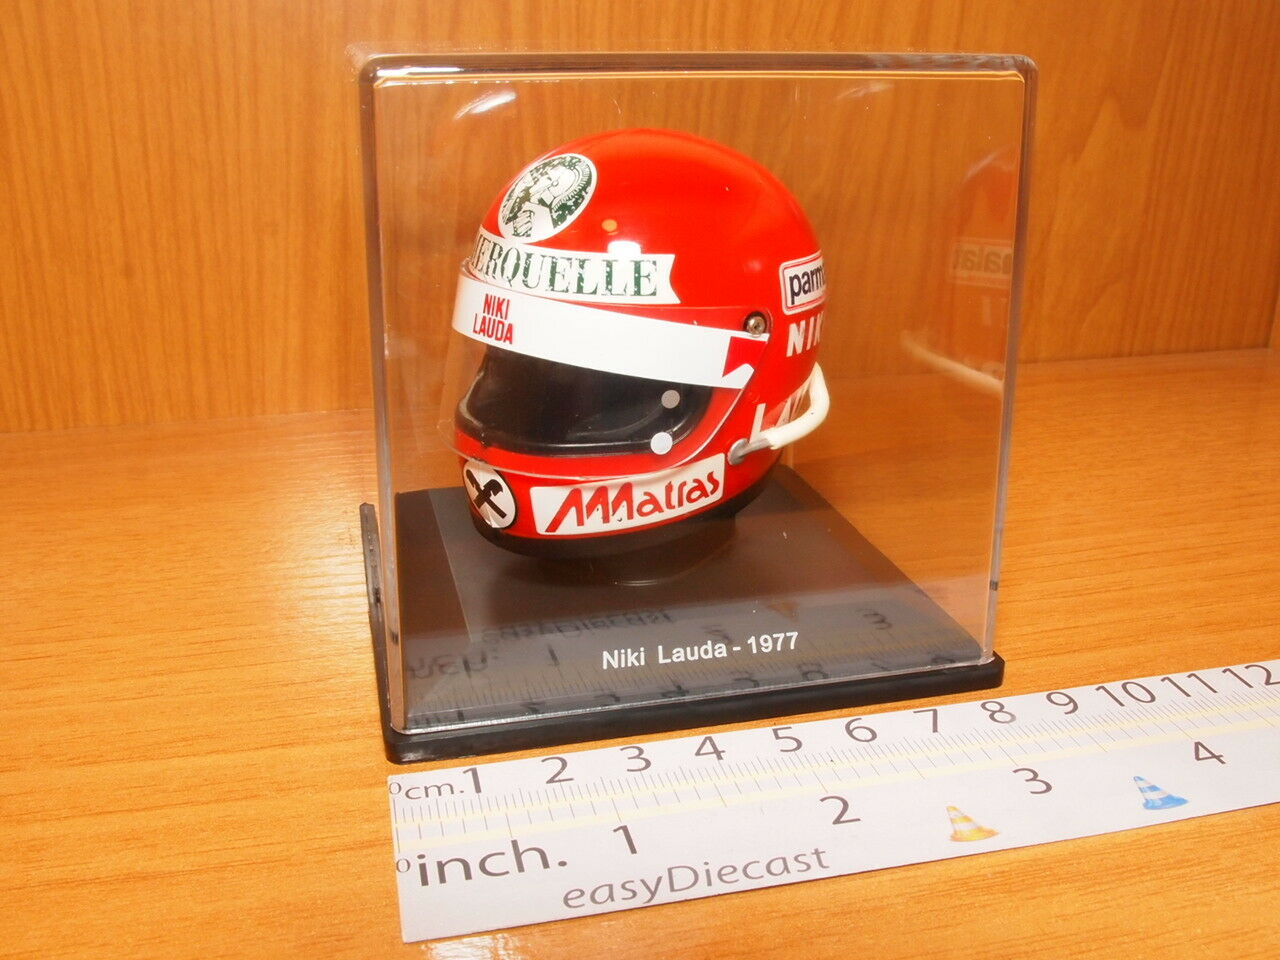 NIKI LAUDA 1977 HELMET 1 5 F1 PARMALAT CASQUE CASCO FORMULA 1 ROMERQUELLE